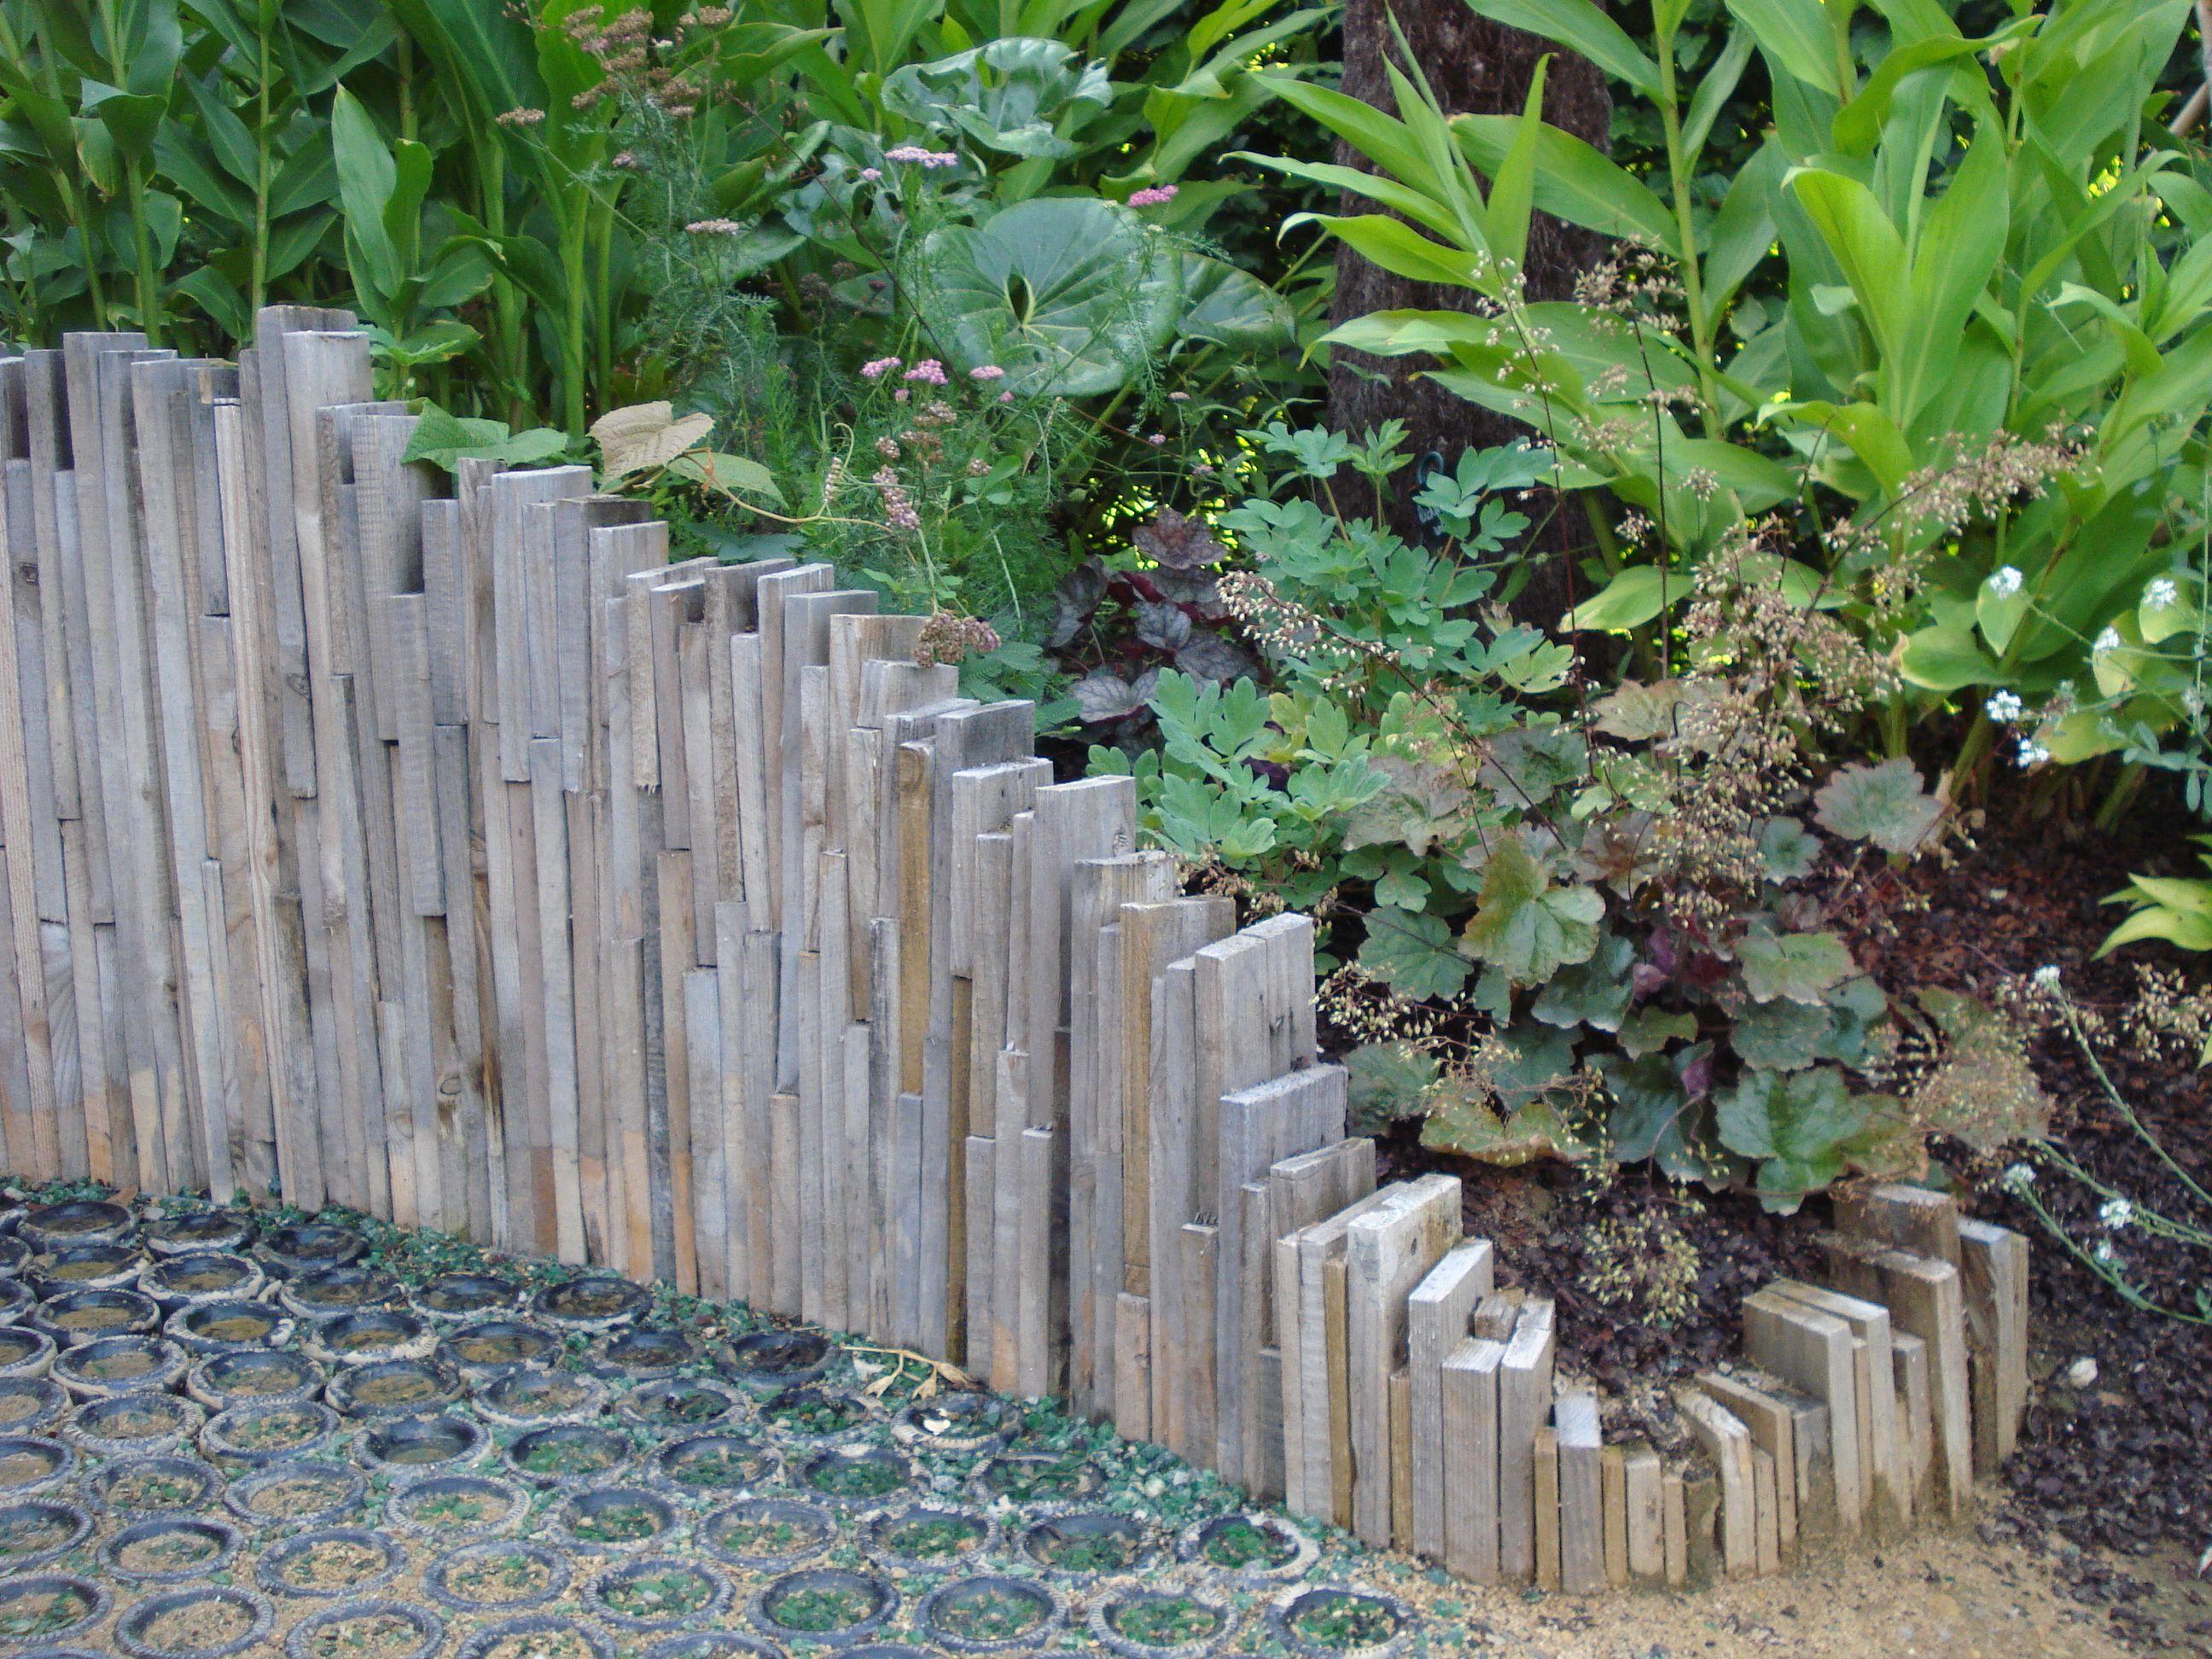 originale bordure | jardin | Pinterest | Bordure jardin, Jardins et ...